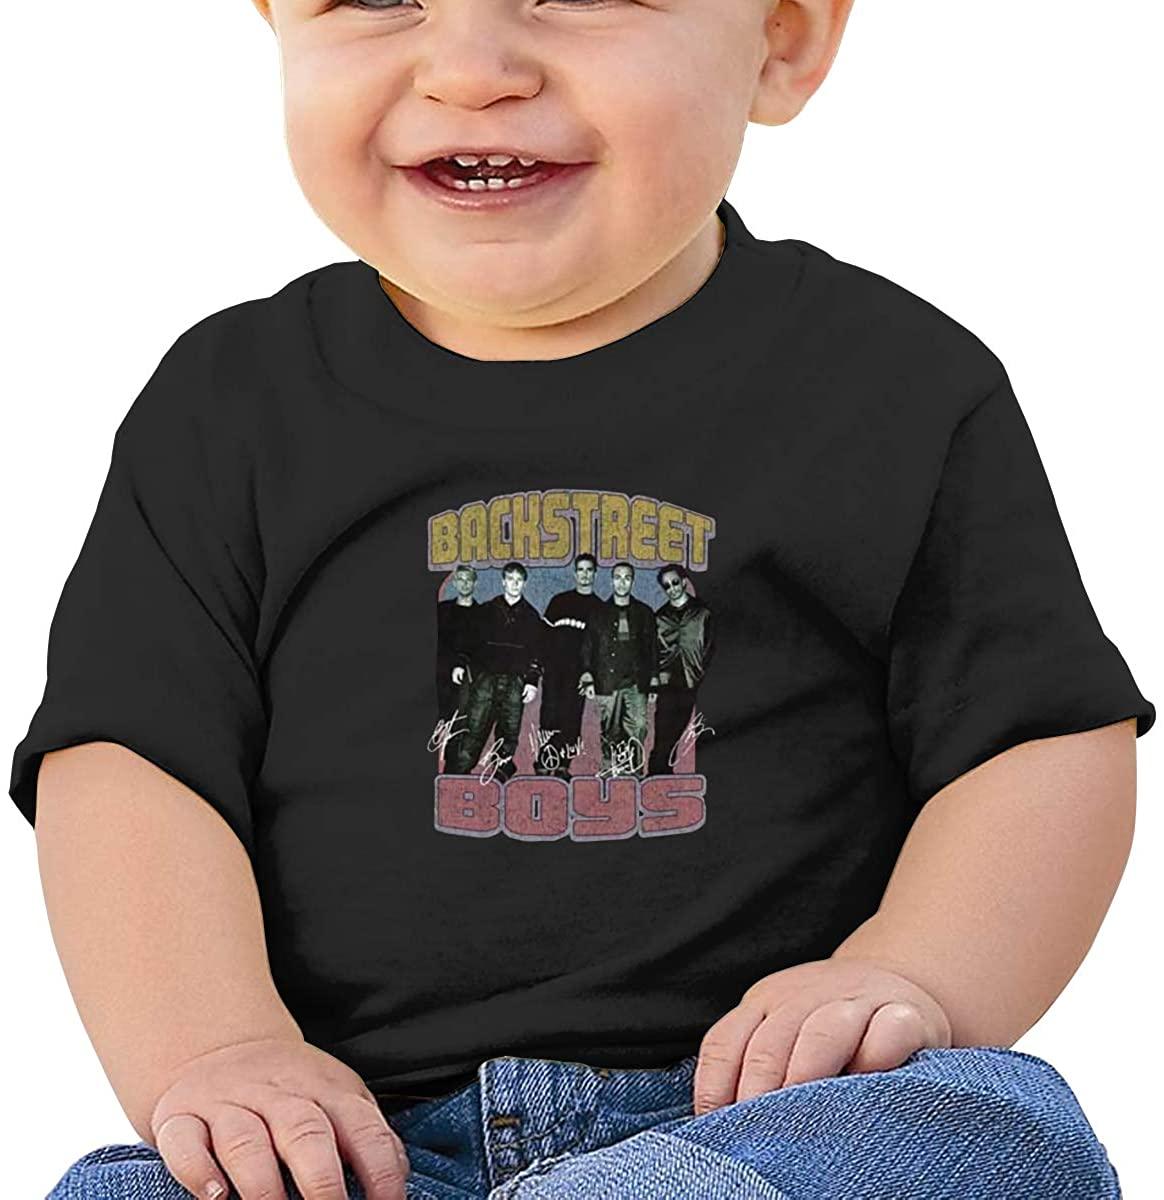 Hangquq Unisex Baby Backstreet Boys Round Neck Shirt Short Sleeve T-Shirt.